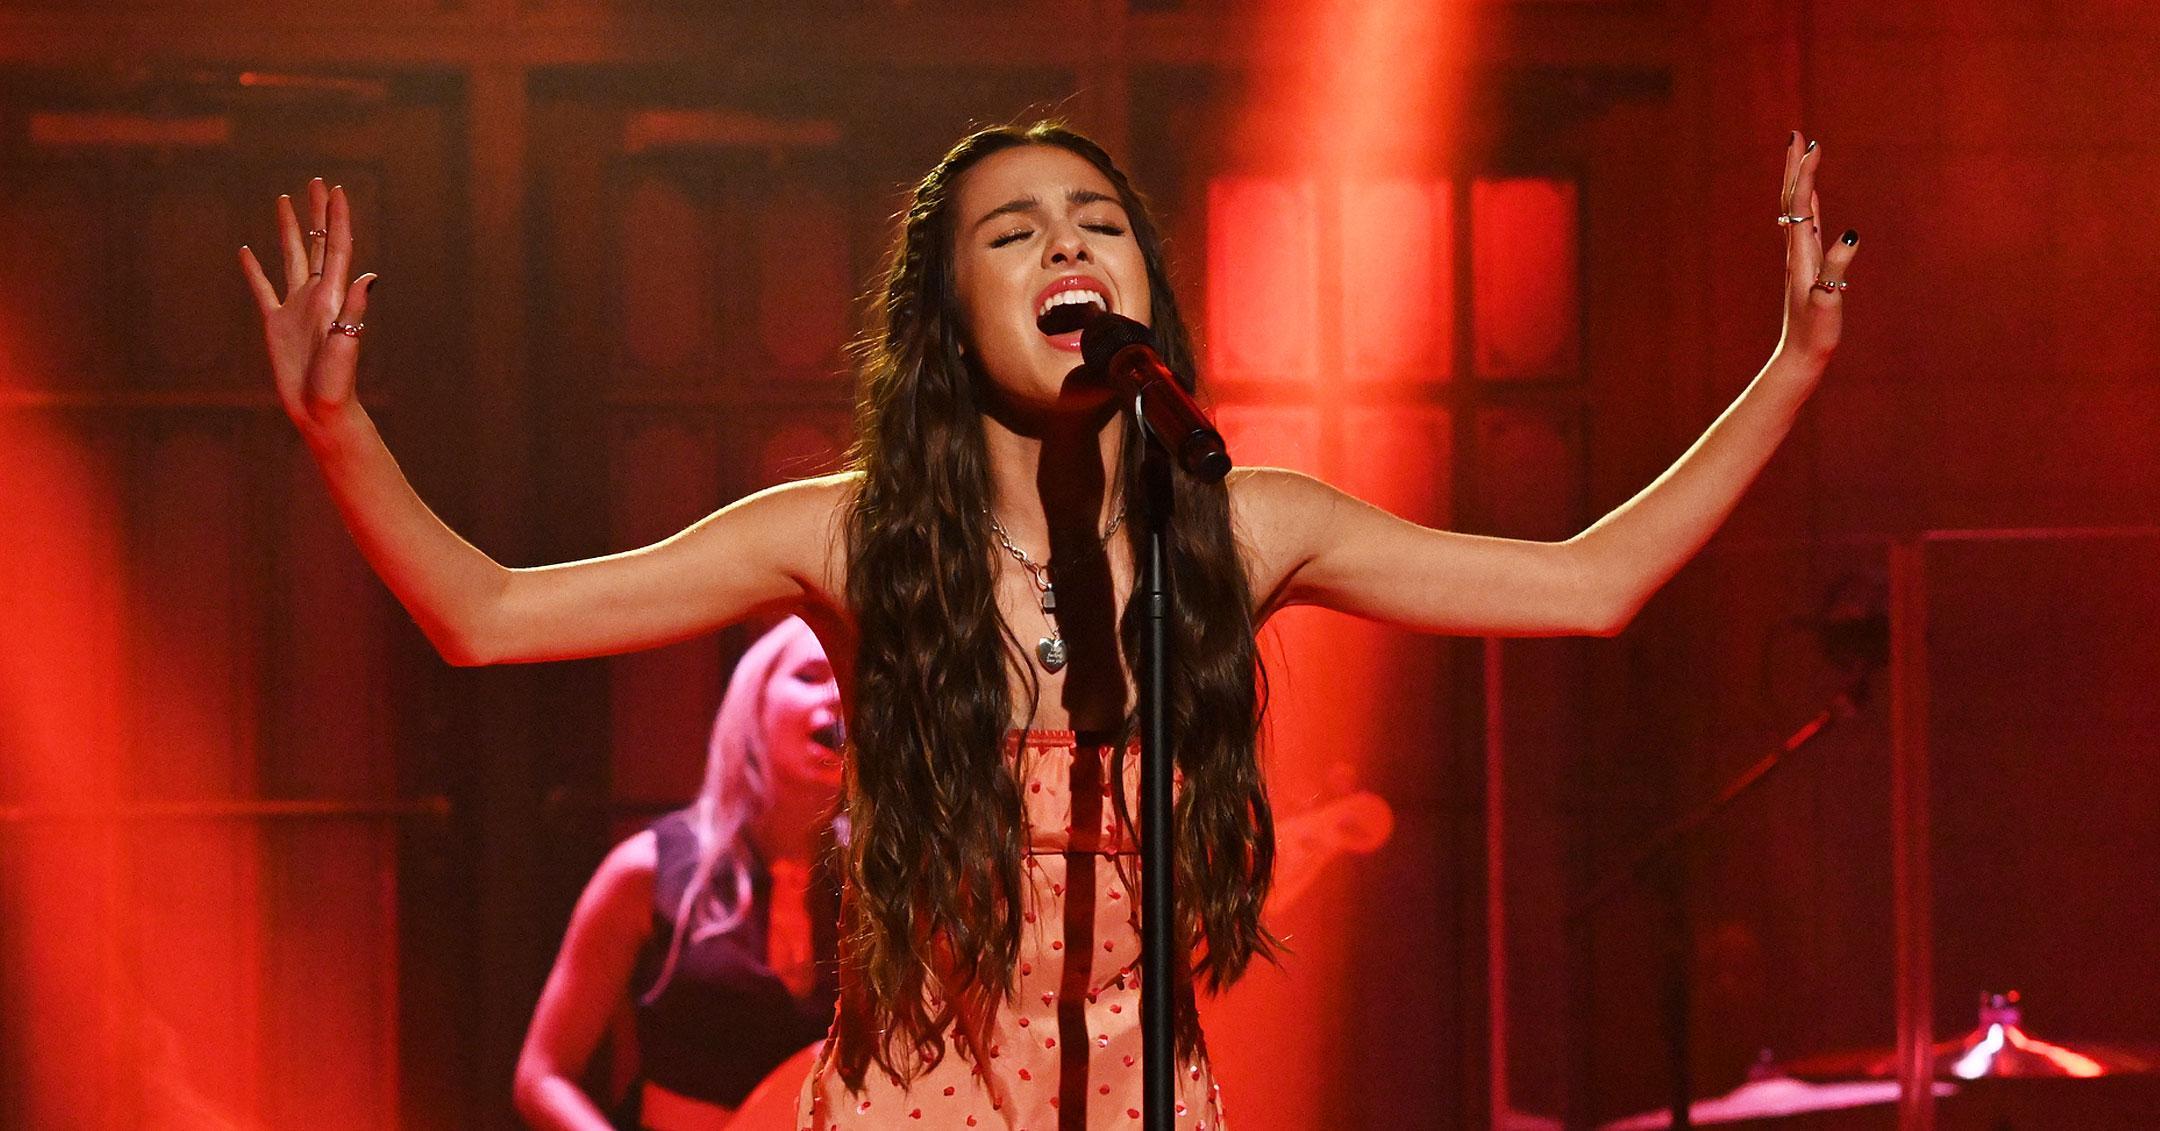 olivia rodrigo isnt afraid to speak her mind in her music mh